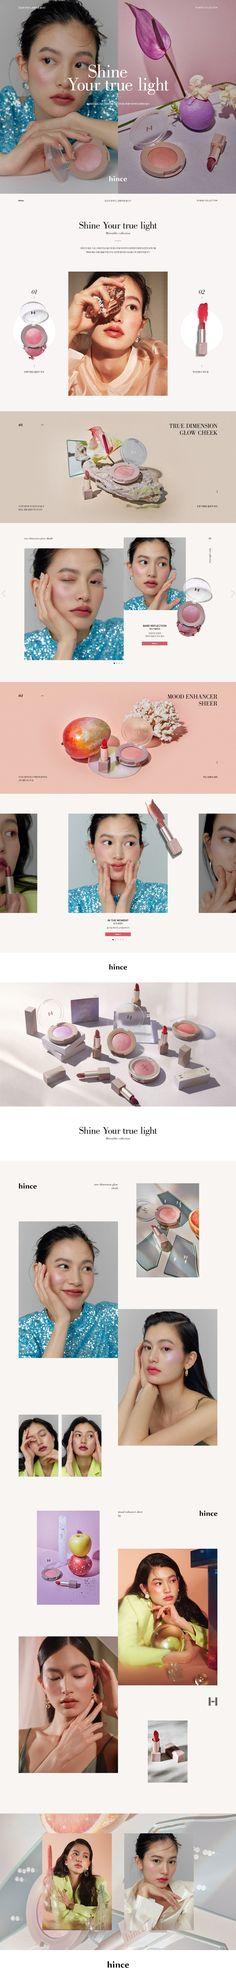 Website Design Layout, Blog Layout, Layout Design, Beauty Web, Lookbook Design, Web Design Examples, Cosmetic Design, Promotional Design, Website Design Inspiration